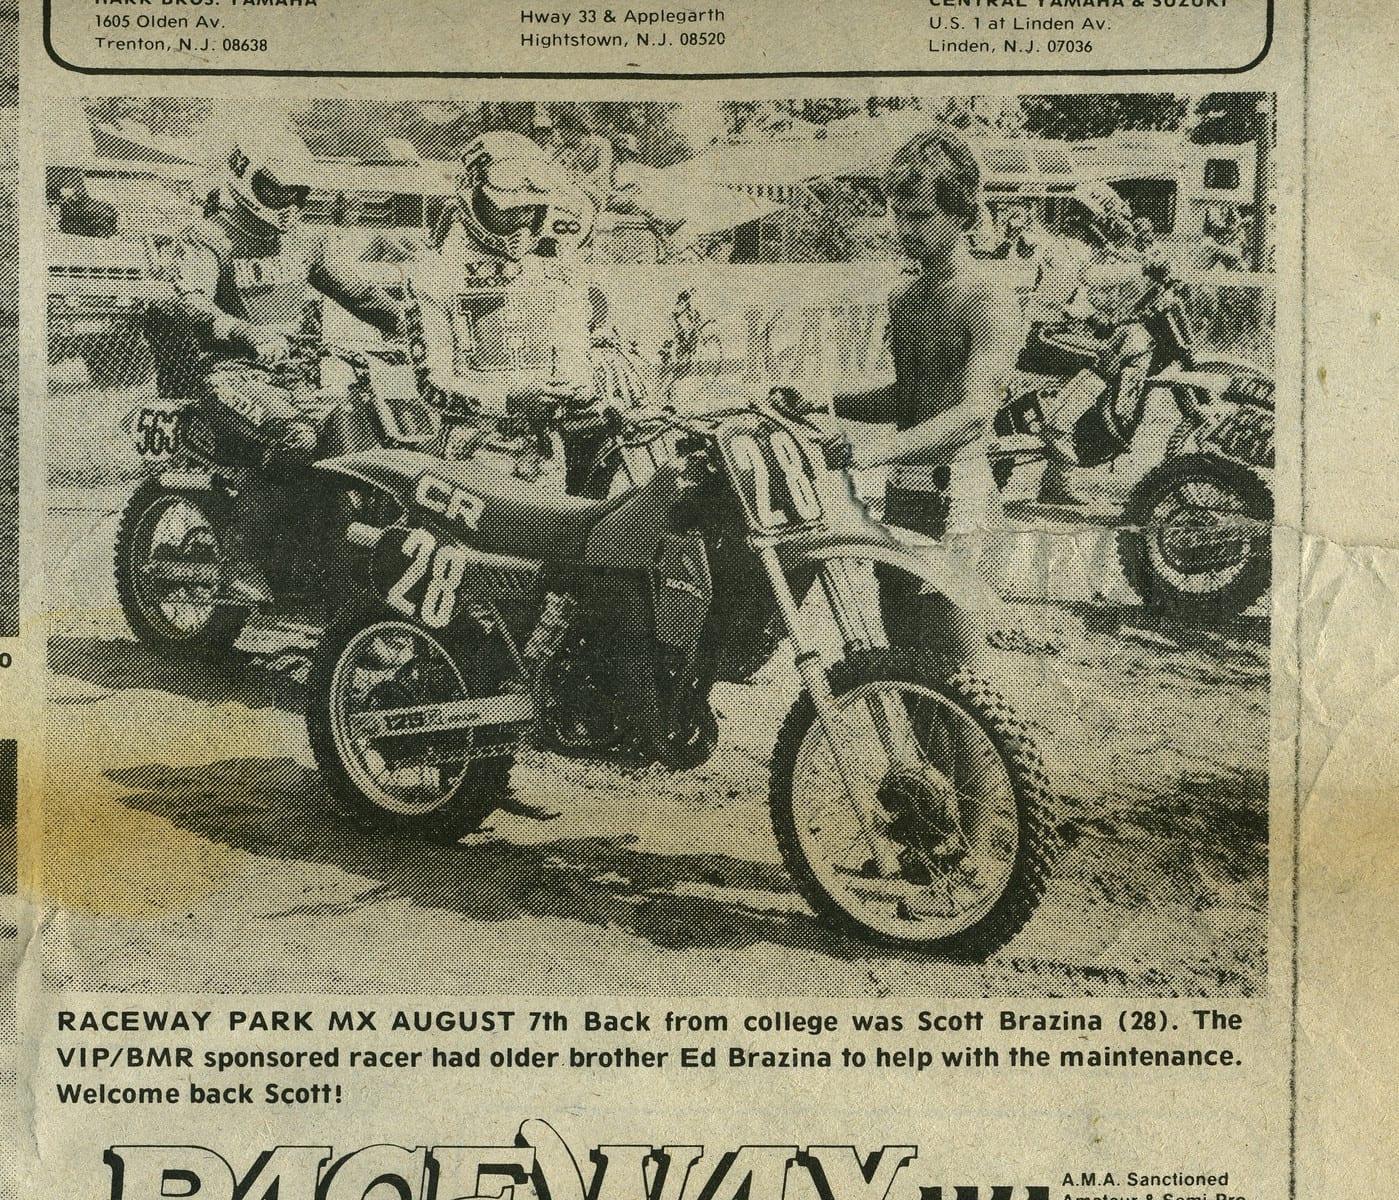 scott brazina 1983